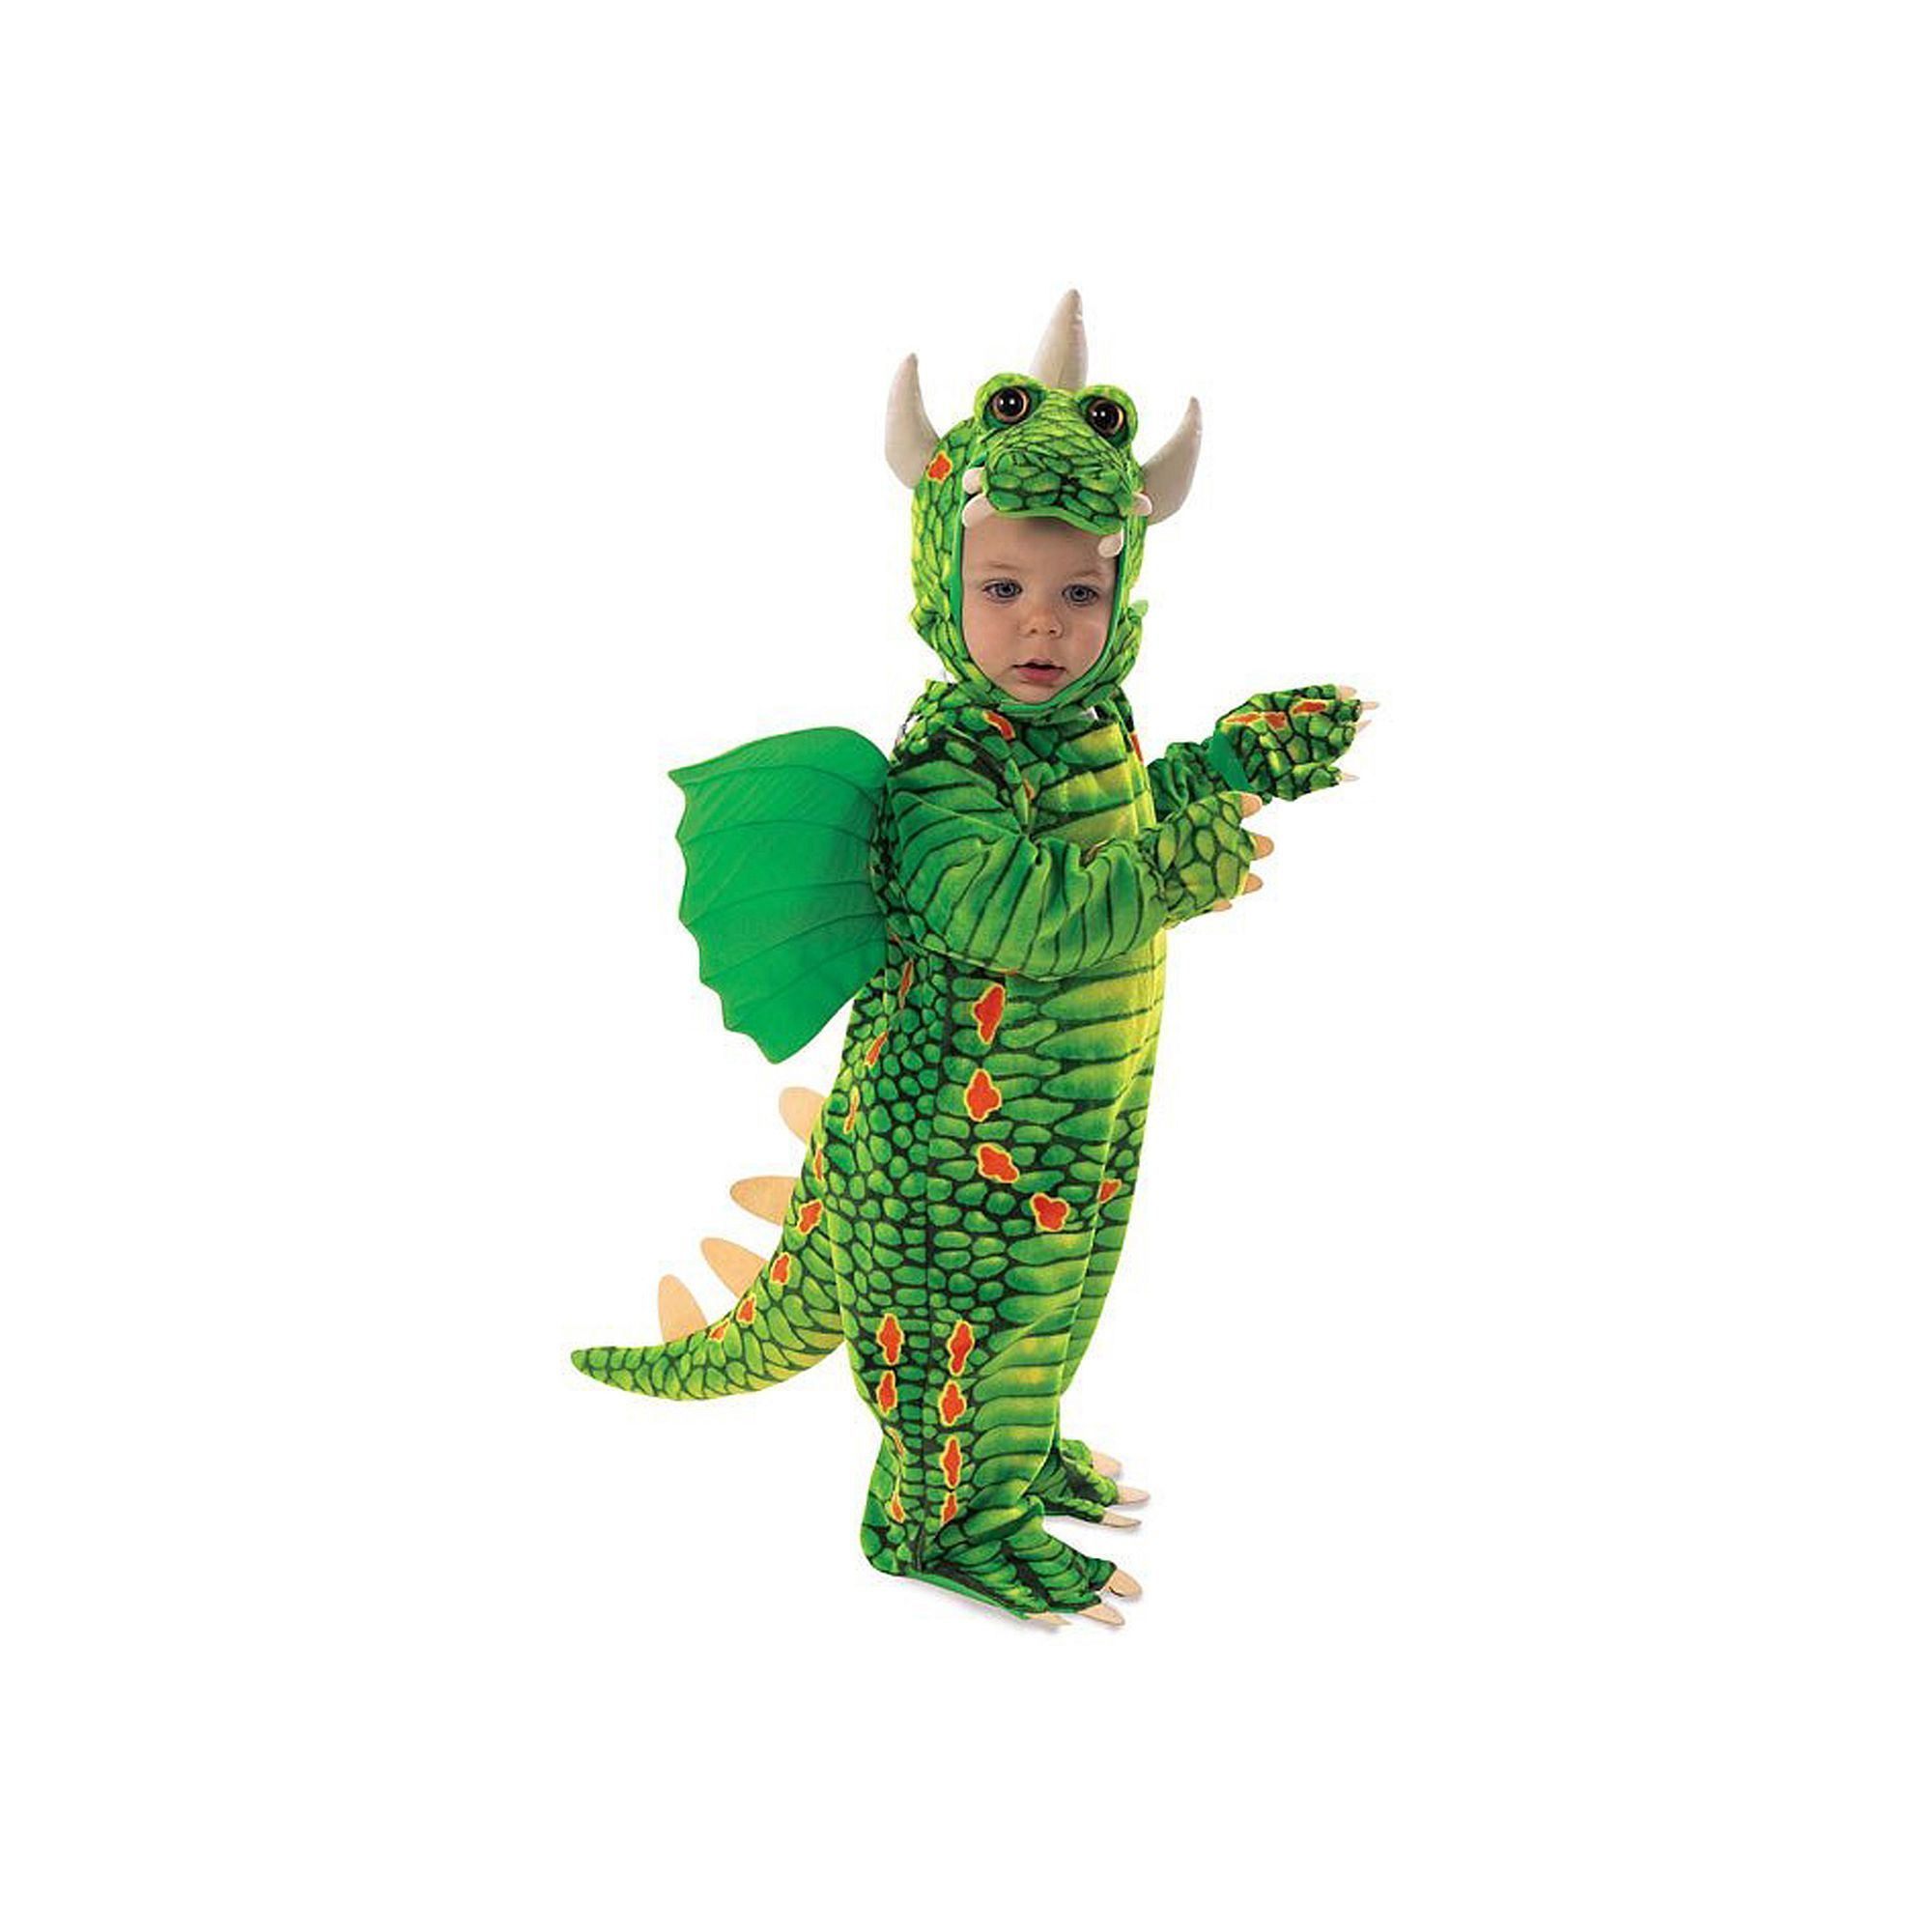 Baby Dragon Costume Boyu0027s Size 6-12MONTHS ...  sc 1 st  Pinterest & Baby Dragon Costume Boyu0027s Size: 6-12MONTHS Green | Baby dragon ...